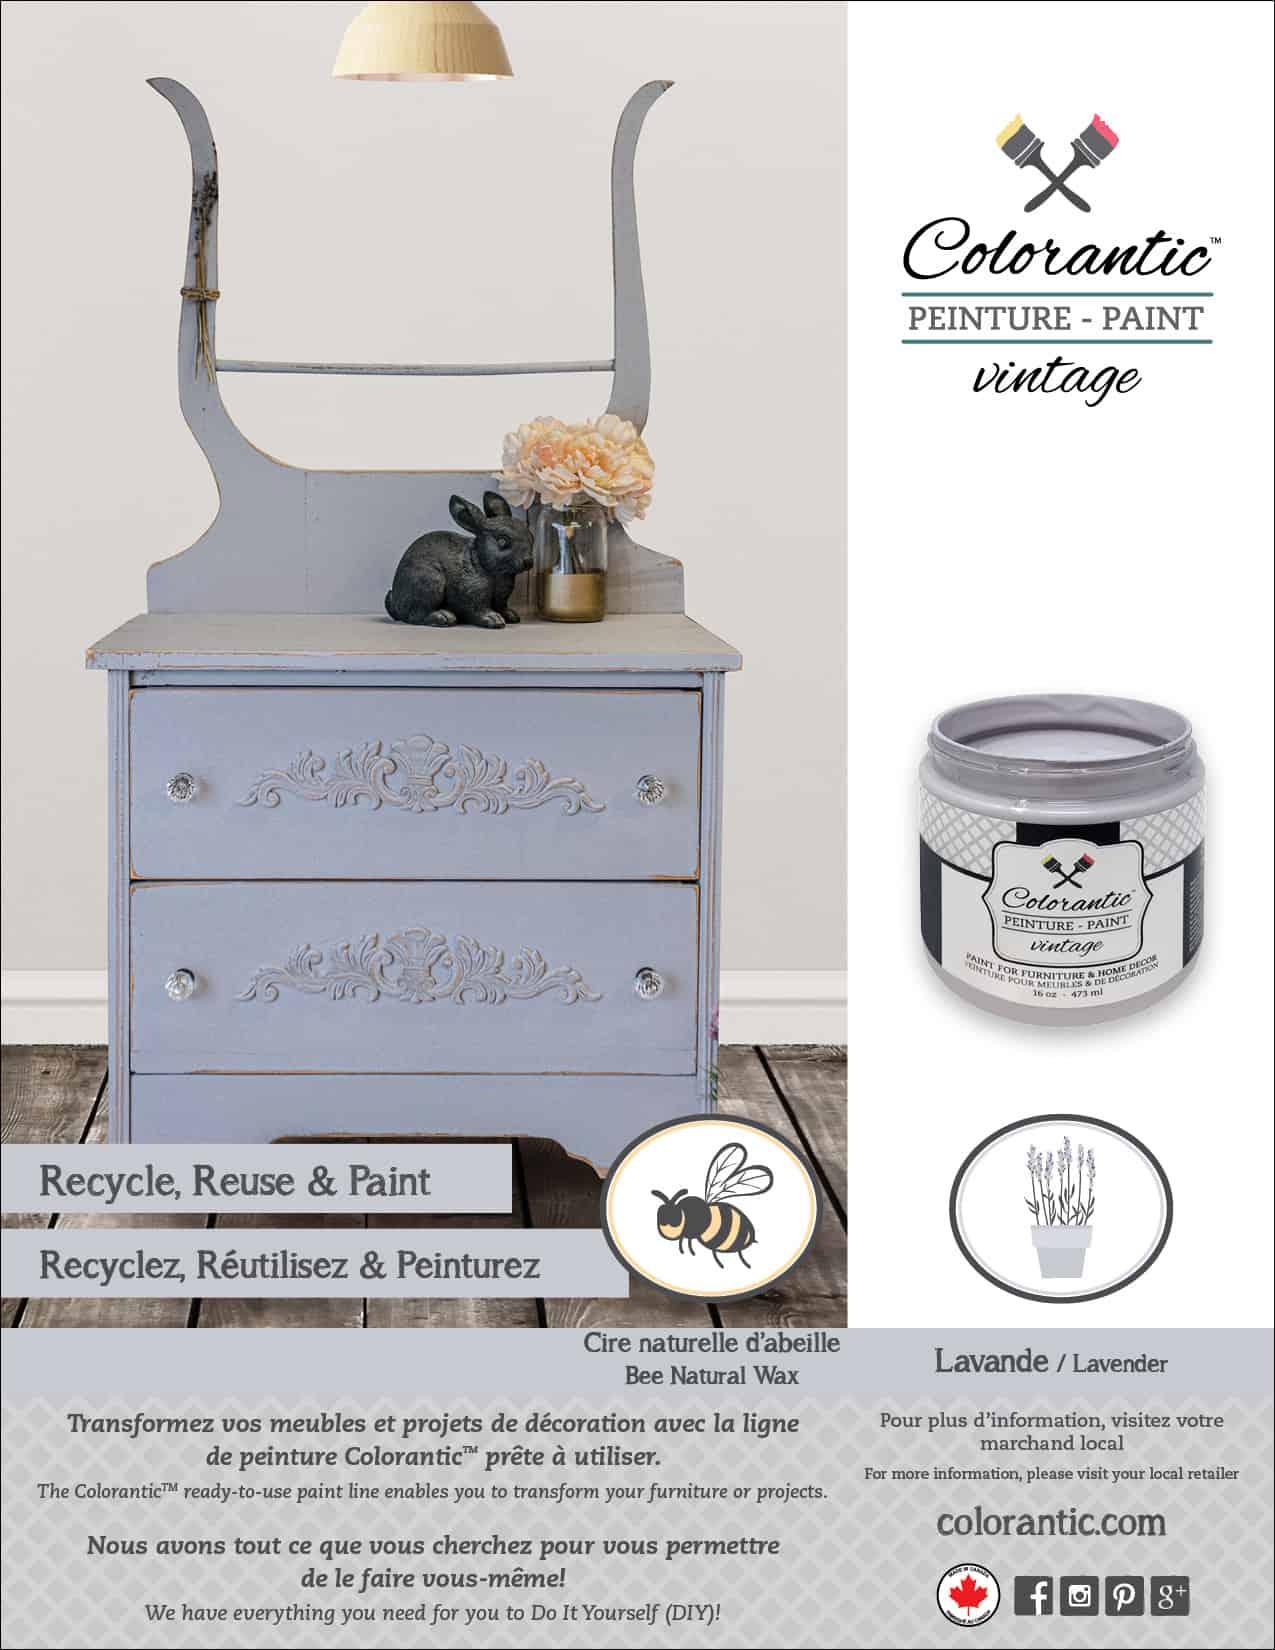 PUB Peinture à la craie Cappuccino - Chalk-Based Paint Cappuccino   Peinture à la craie Colorantic   Chalk-Based Paint Colorantic